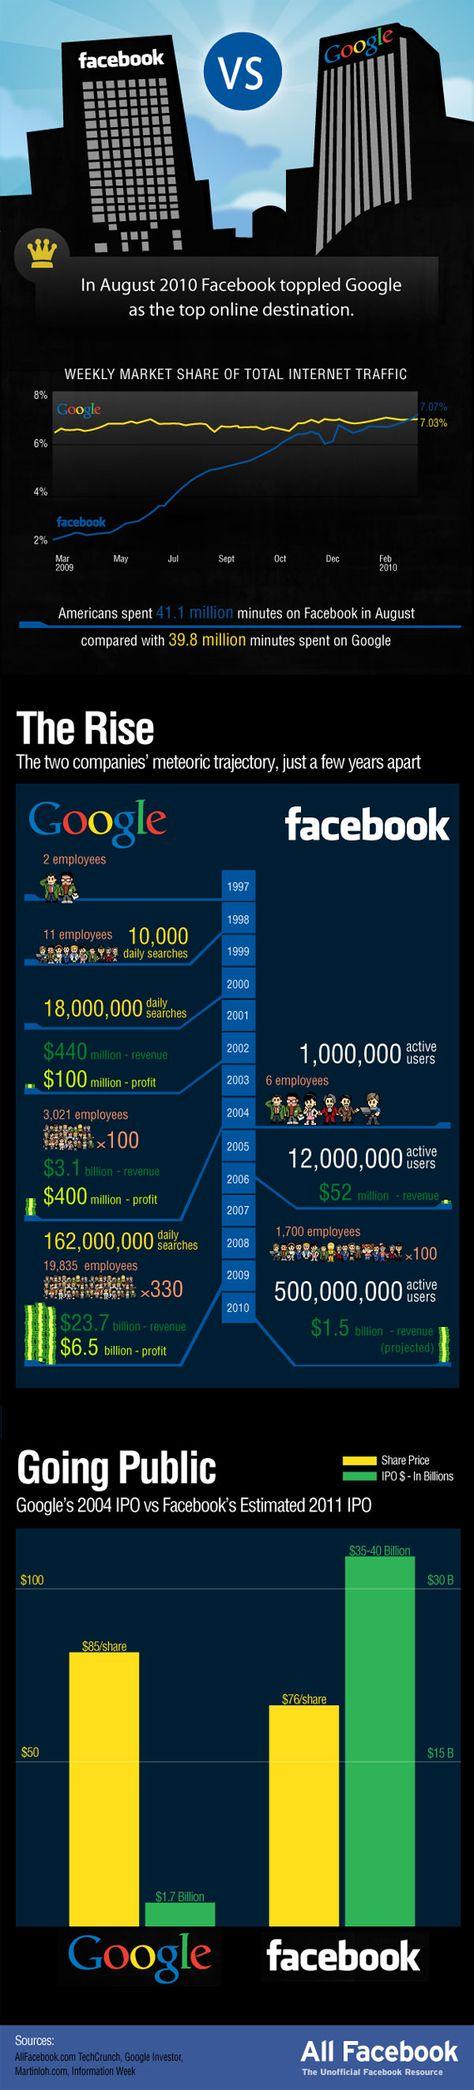 Facebook v. Google